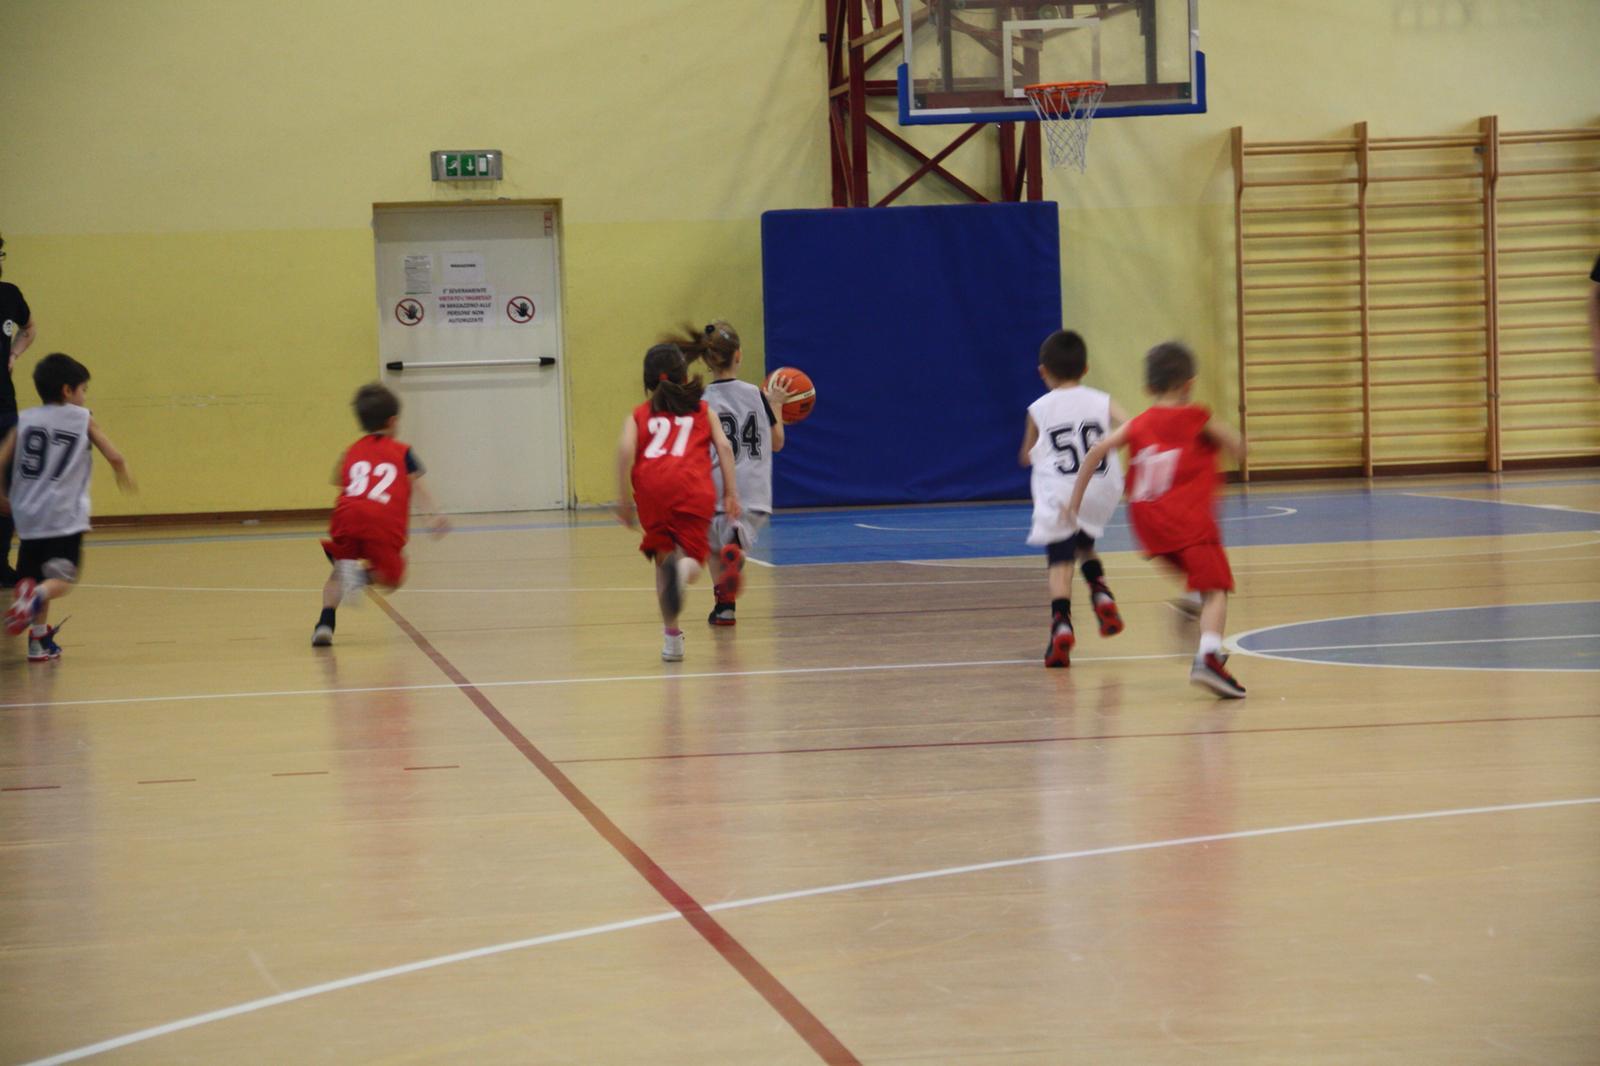 Basket per i bambini, sport e salute